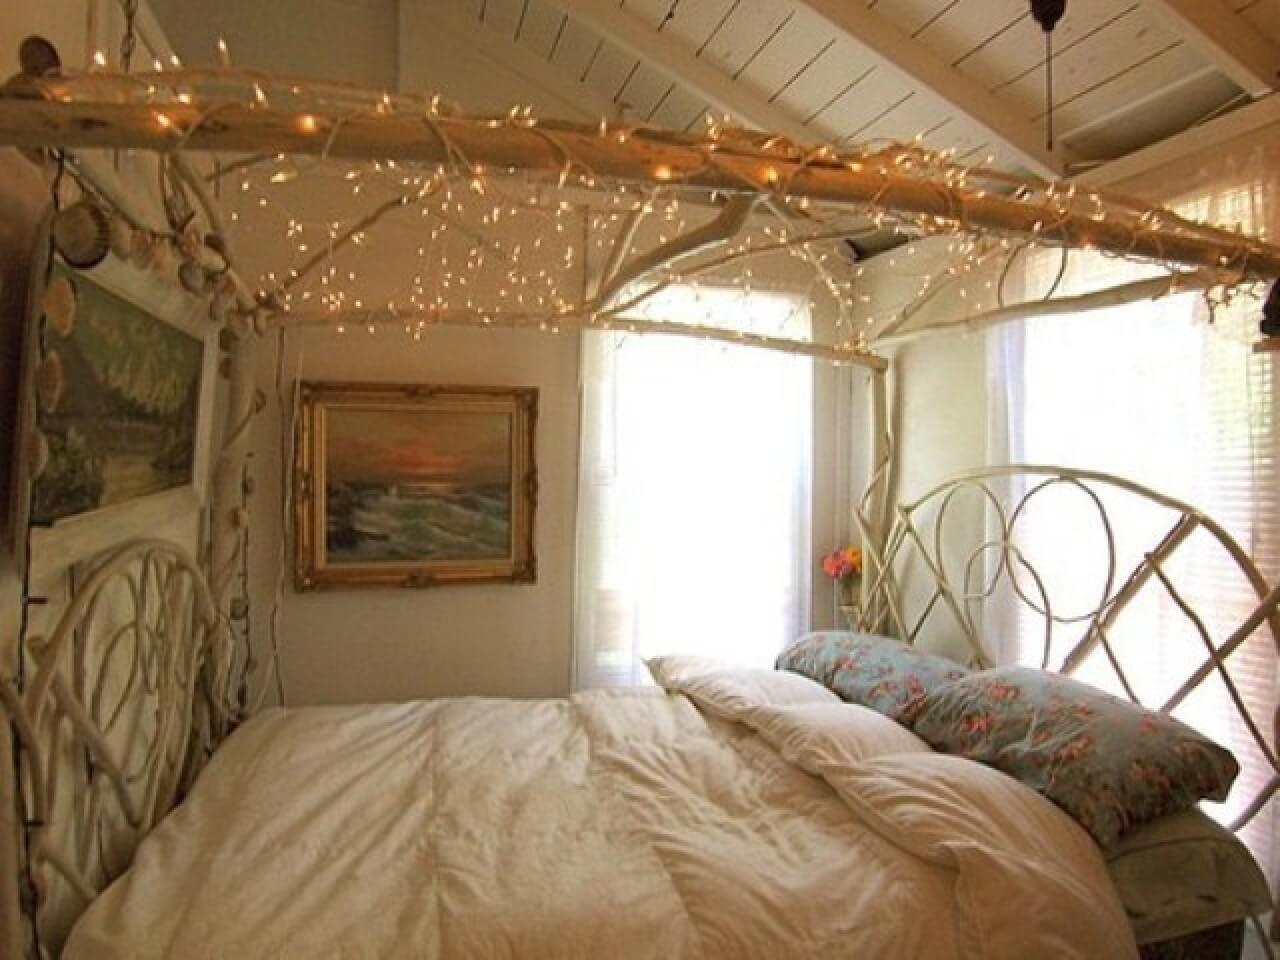 twinkal light in bedroom